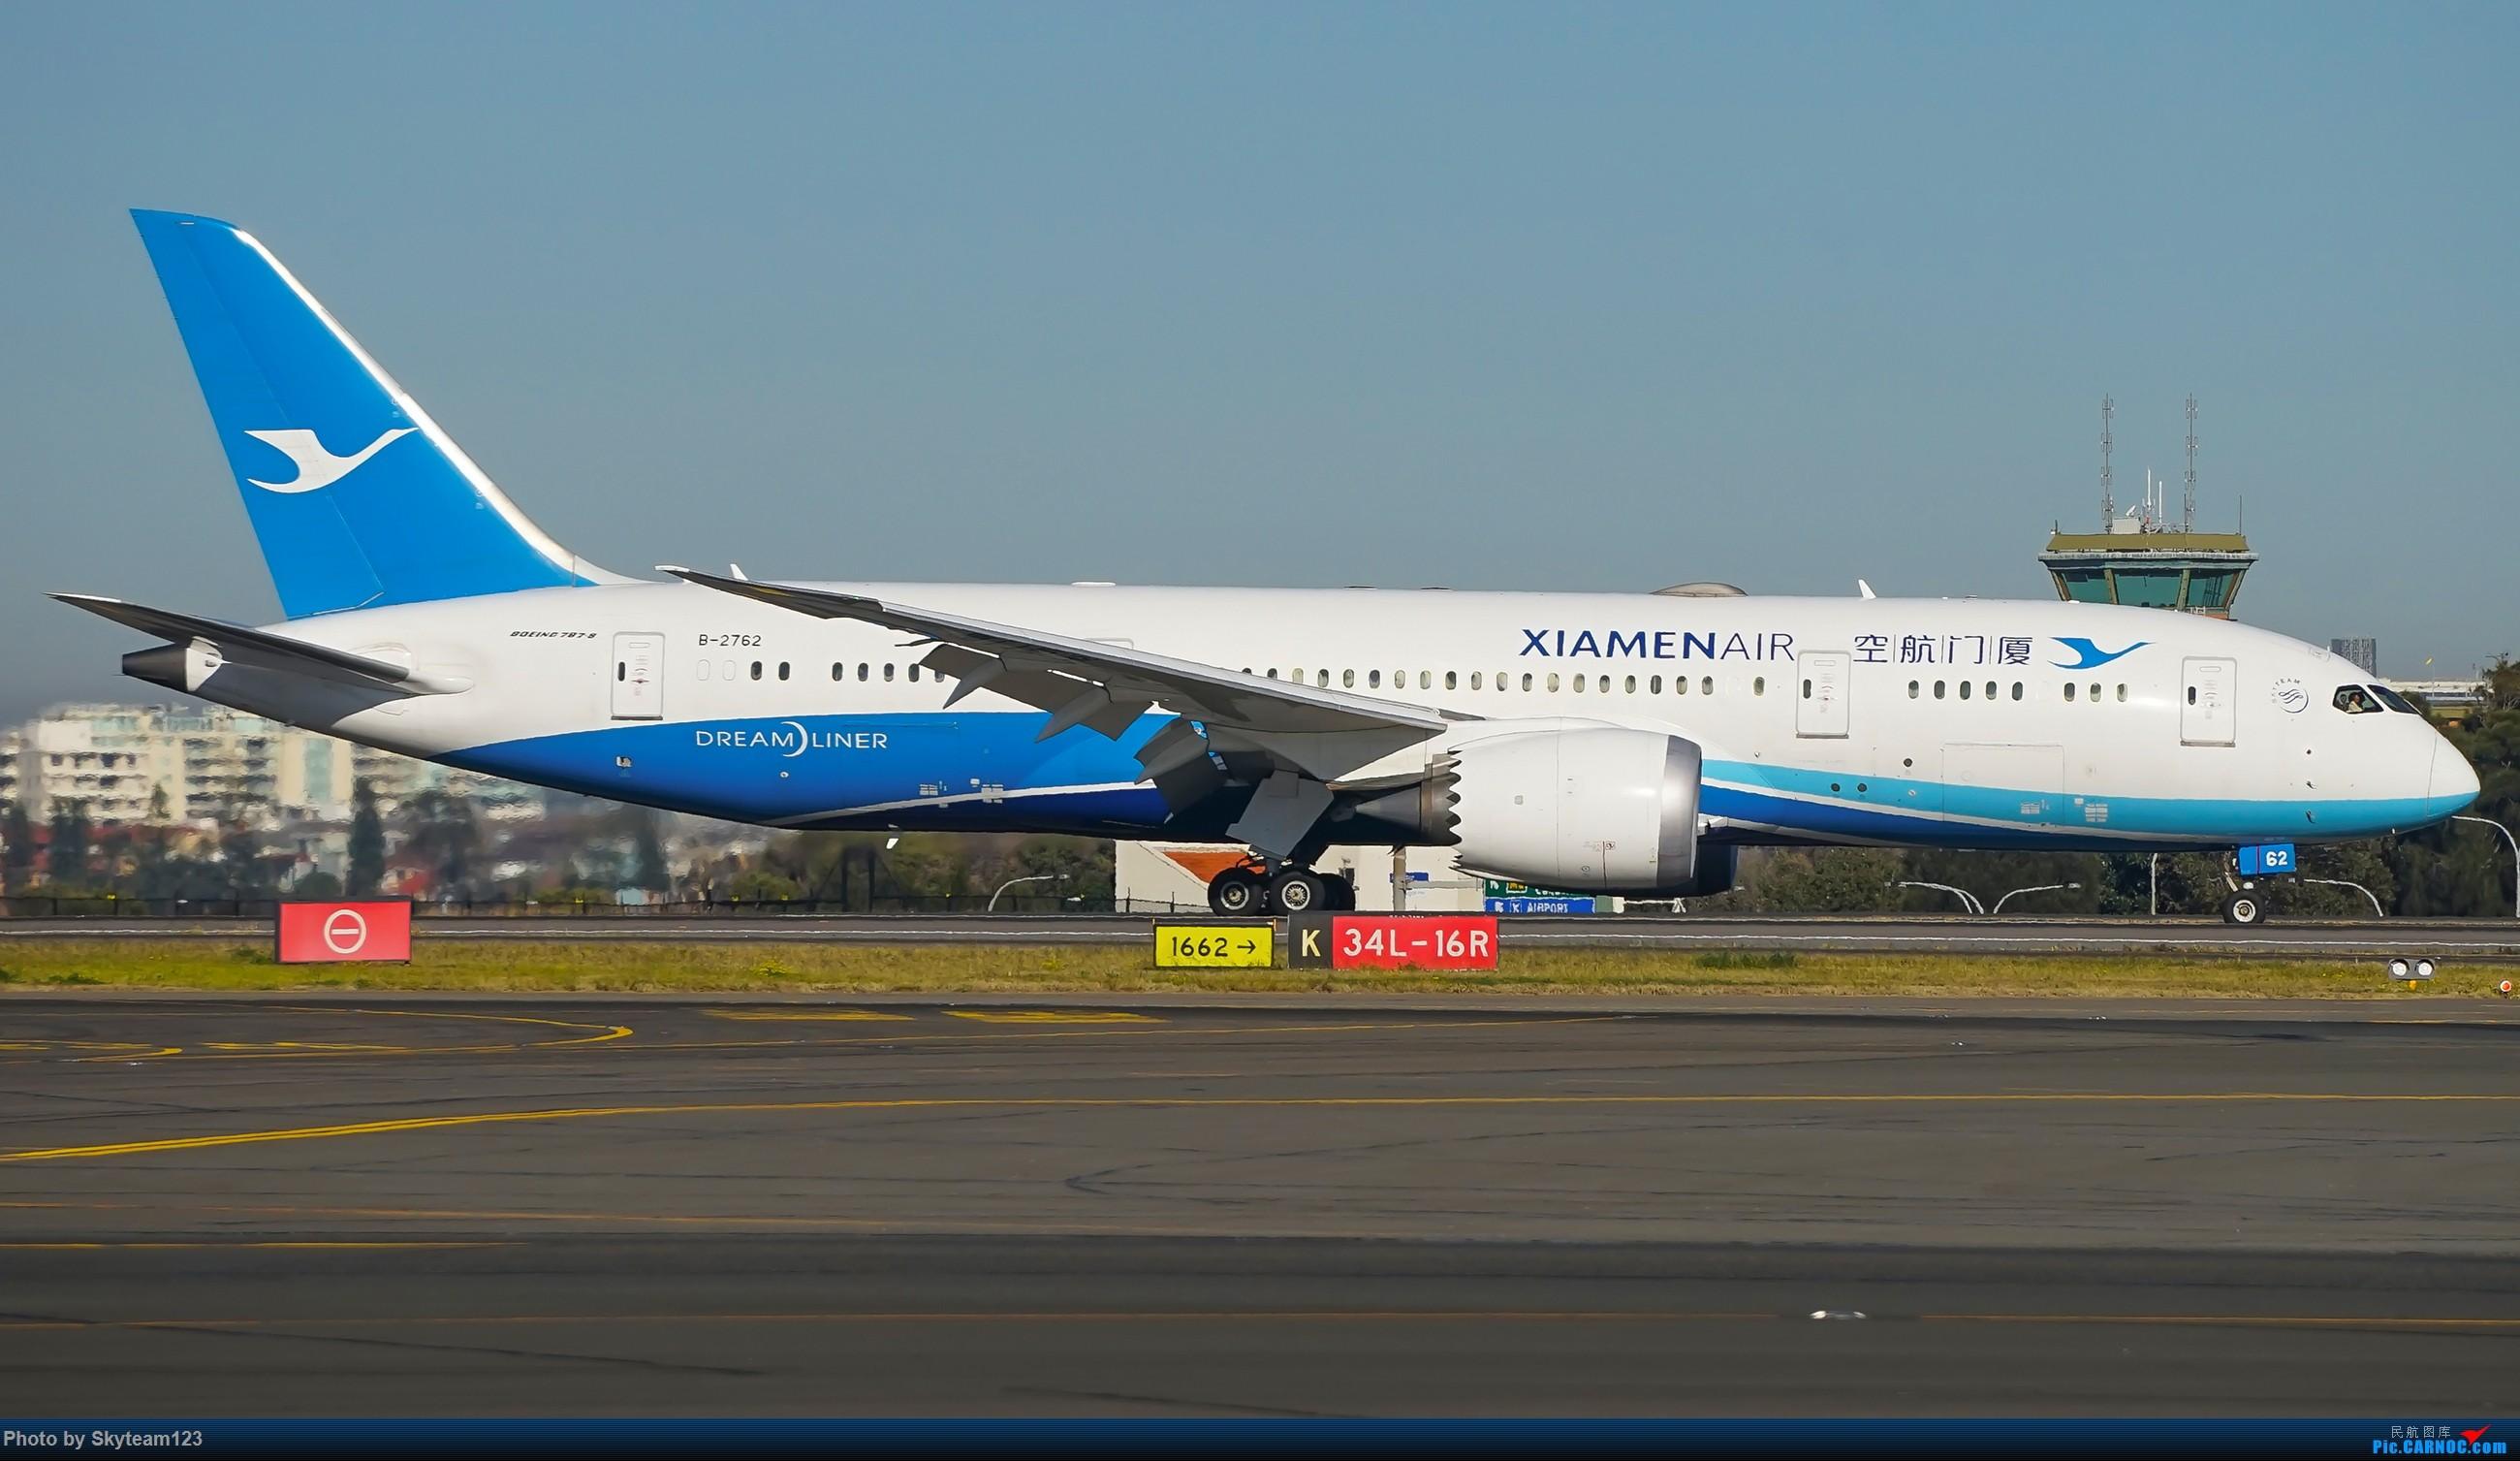 Re:[原创][SYD] 再访Blu EMU停车场 早上34L抵港出发杂图几张 BOEING 787-8 B-2762 澳大利亚悉尼金斯福德·史密斯机场